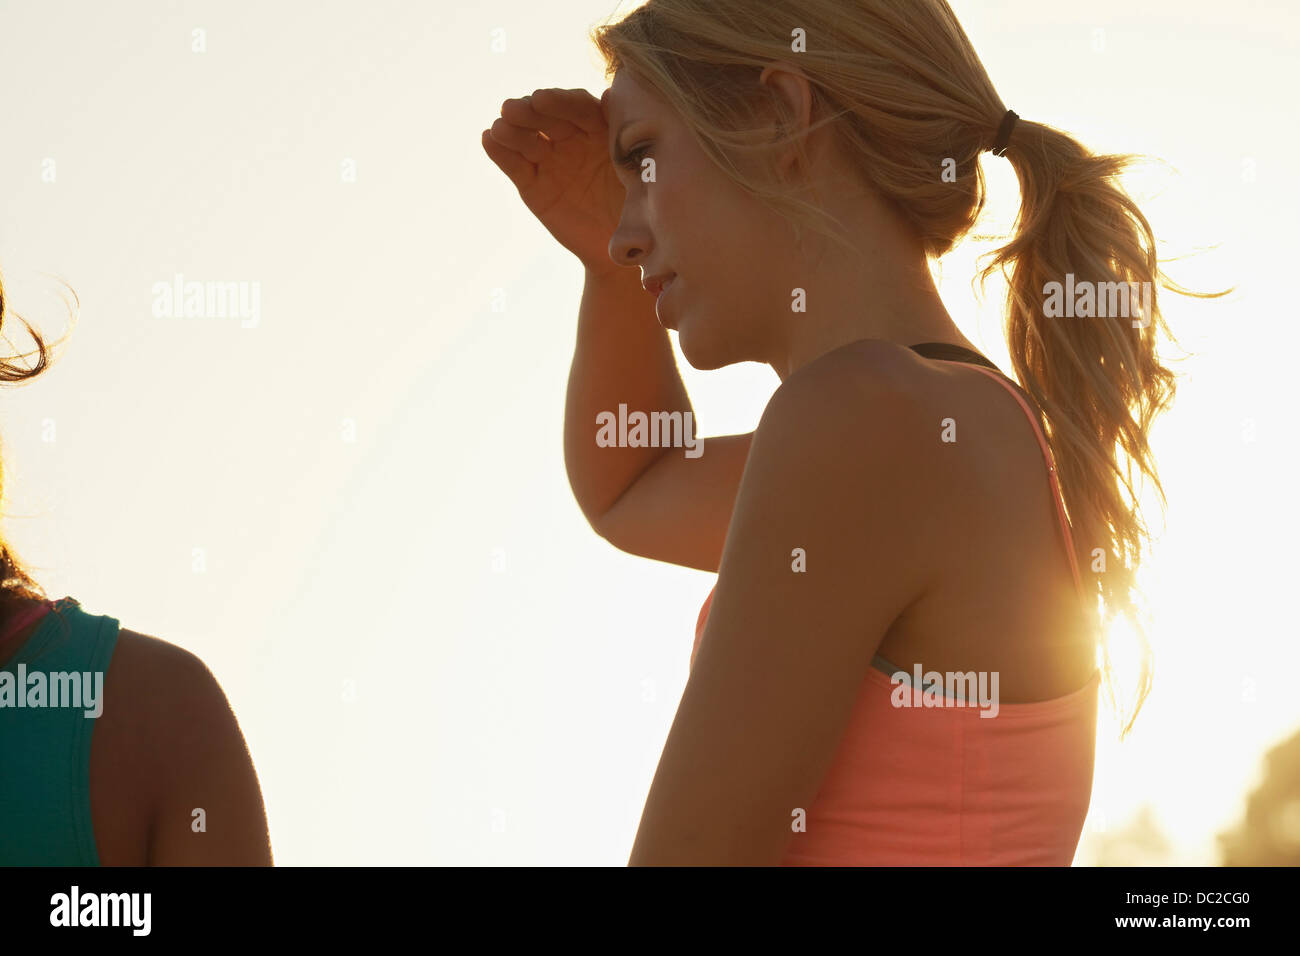 Woman blocking sun with hand Stock Photo